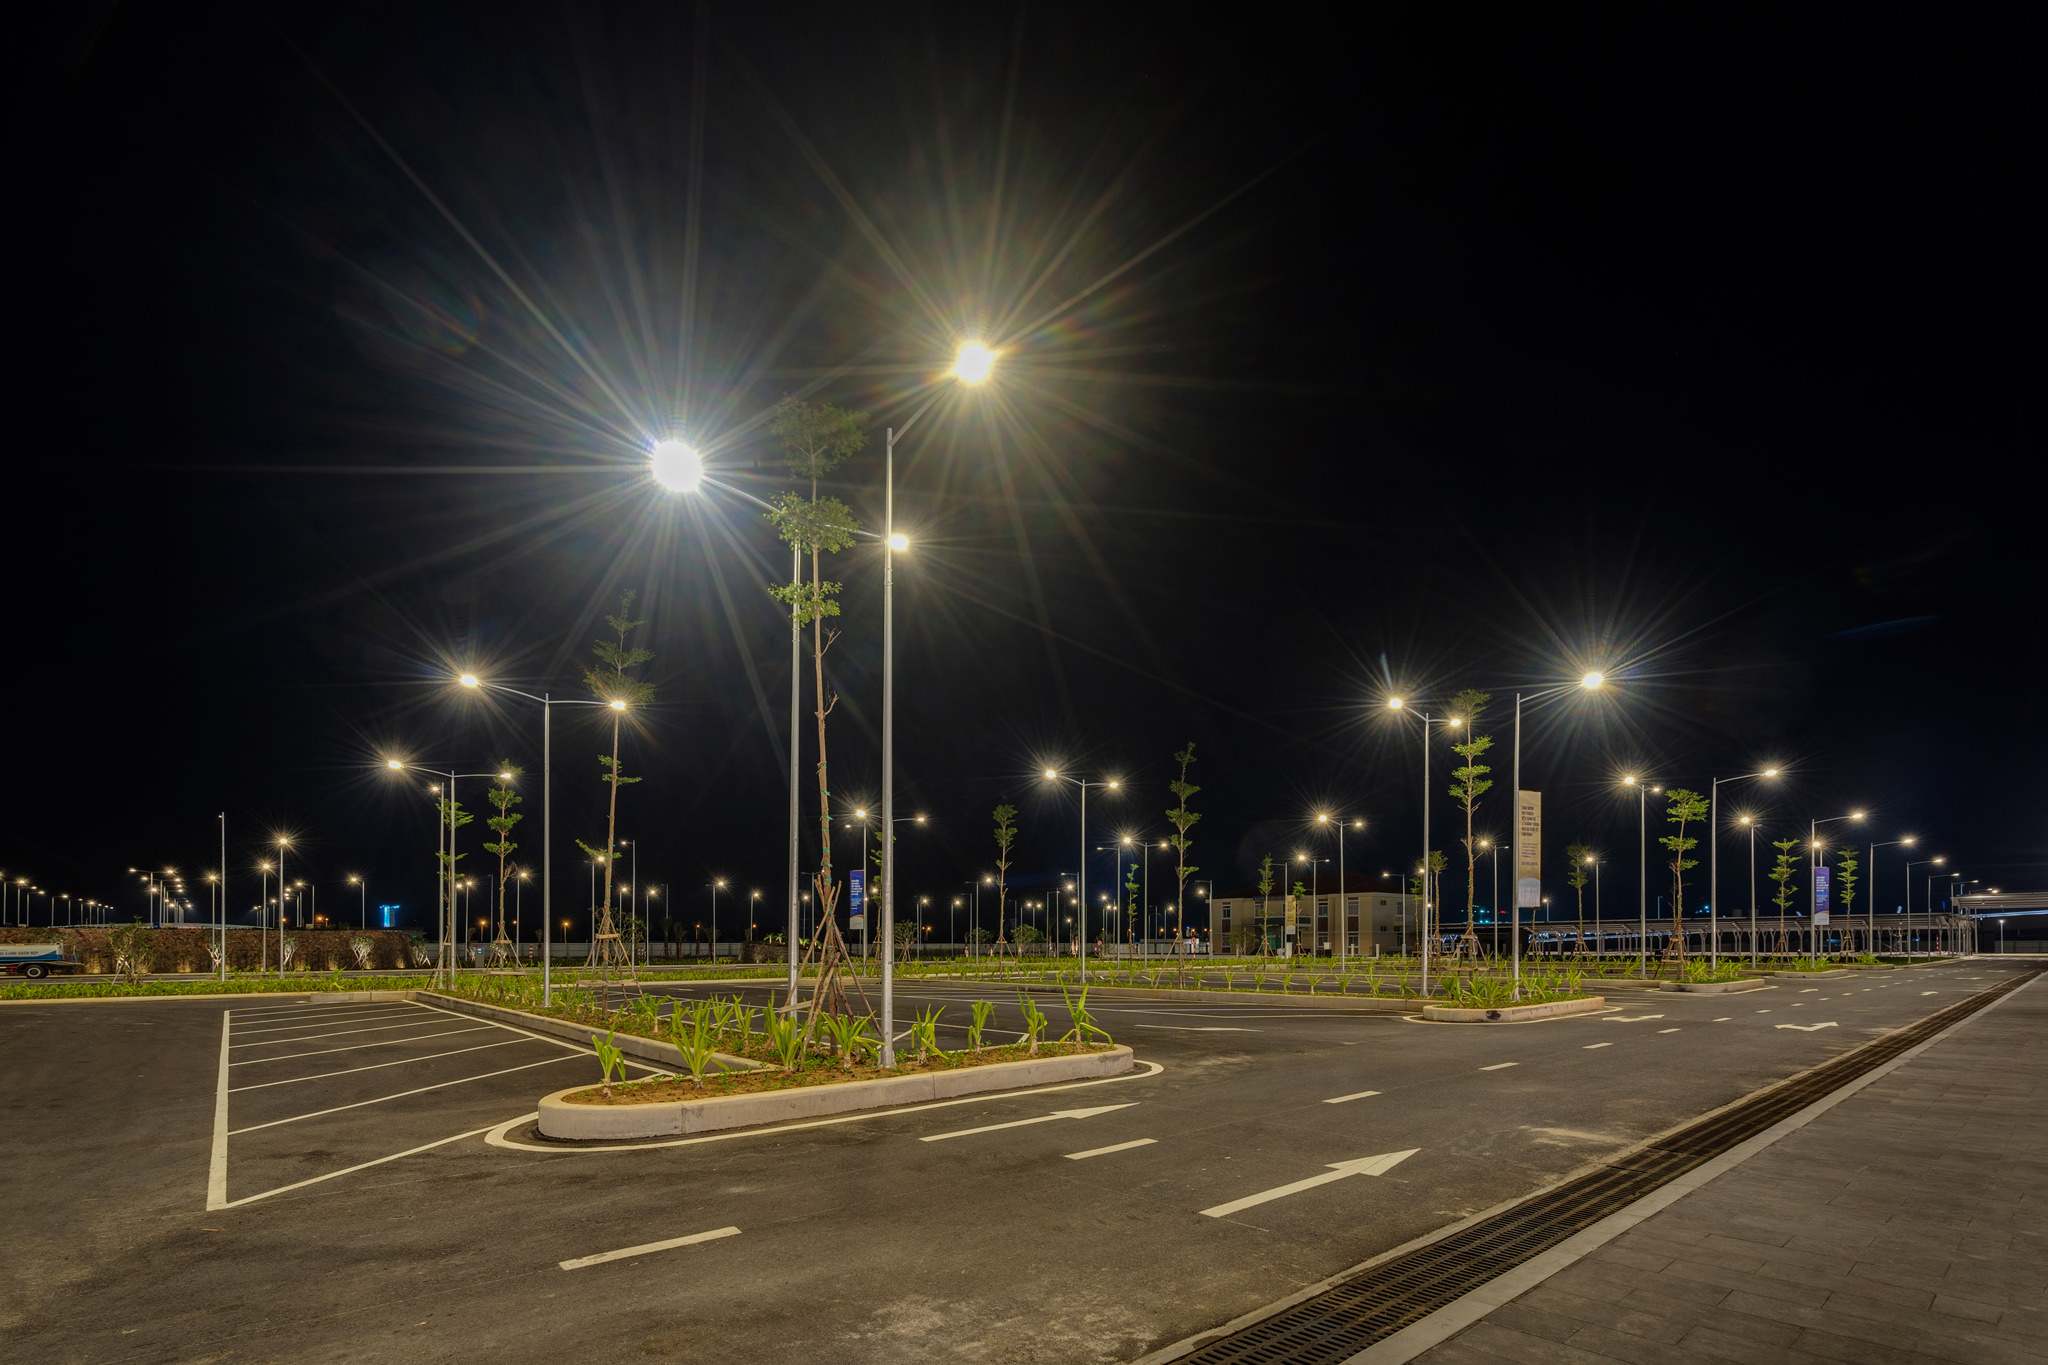 20180626 - Cam Ranh Airport - Architecture - 0393.jpg